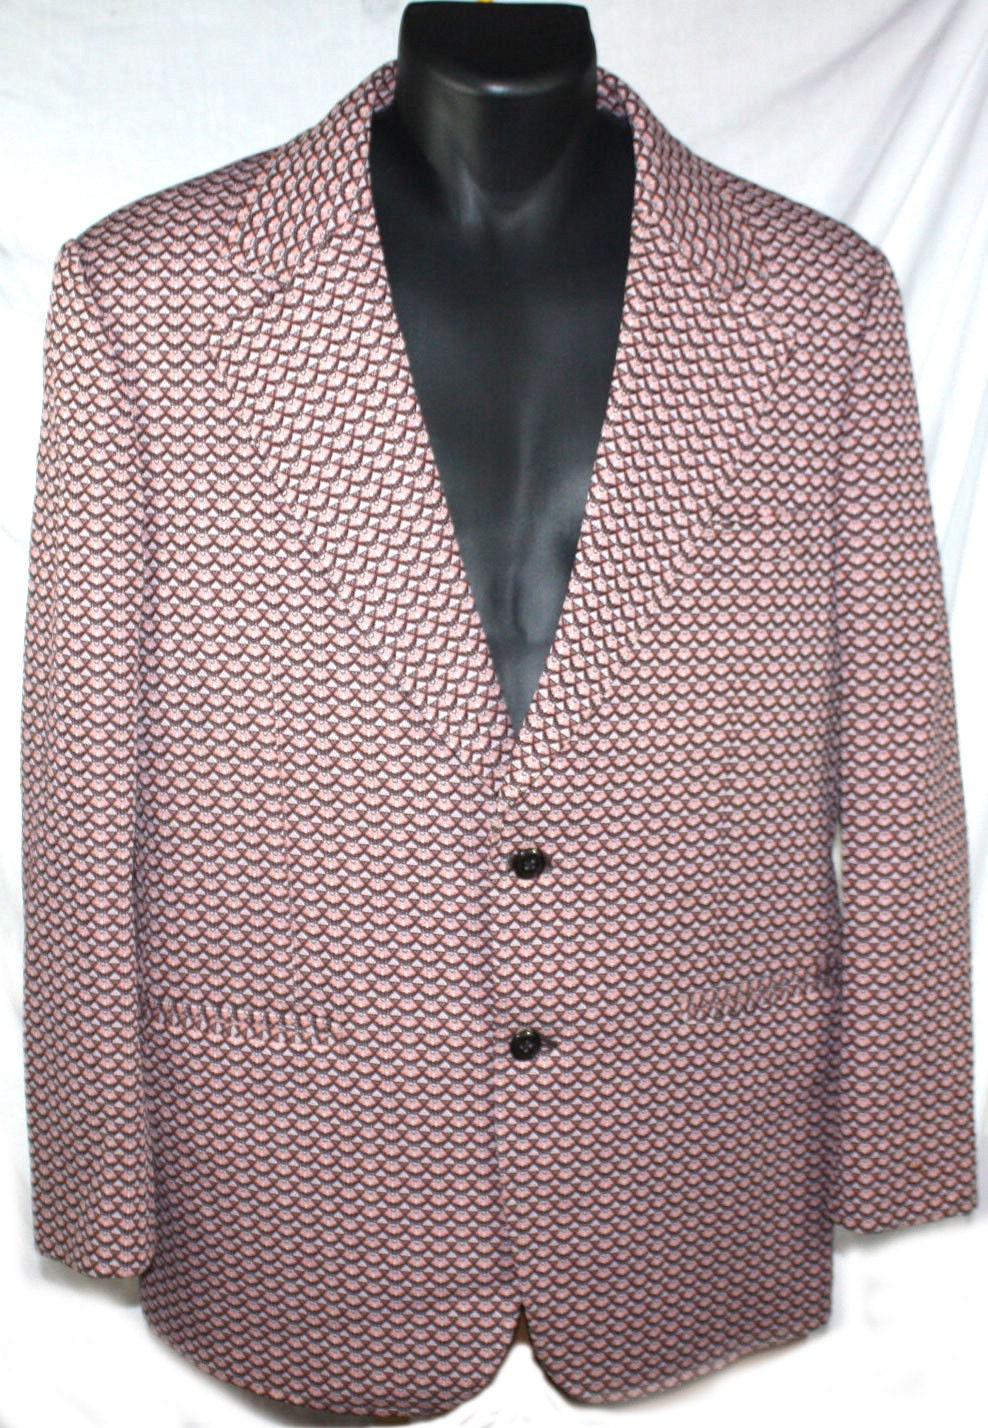 Vintage sport coat Etsy